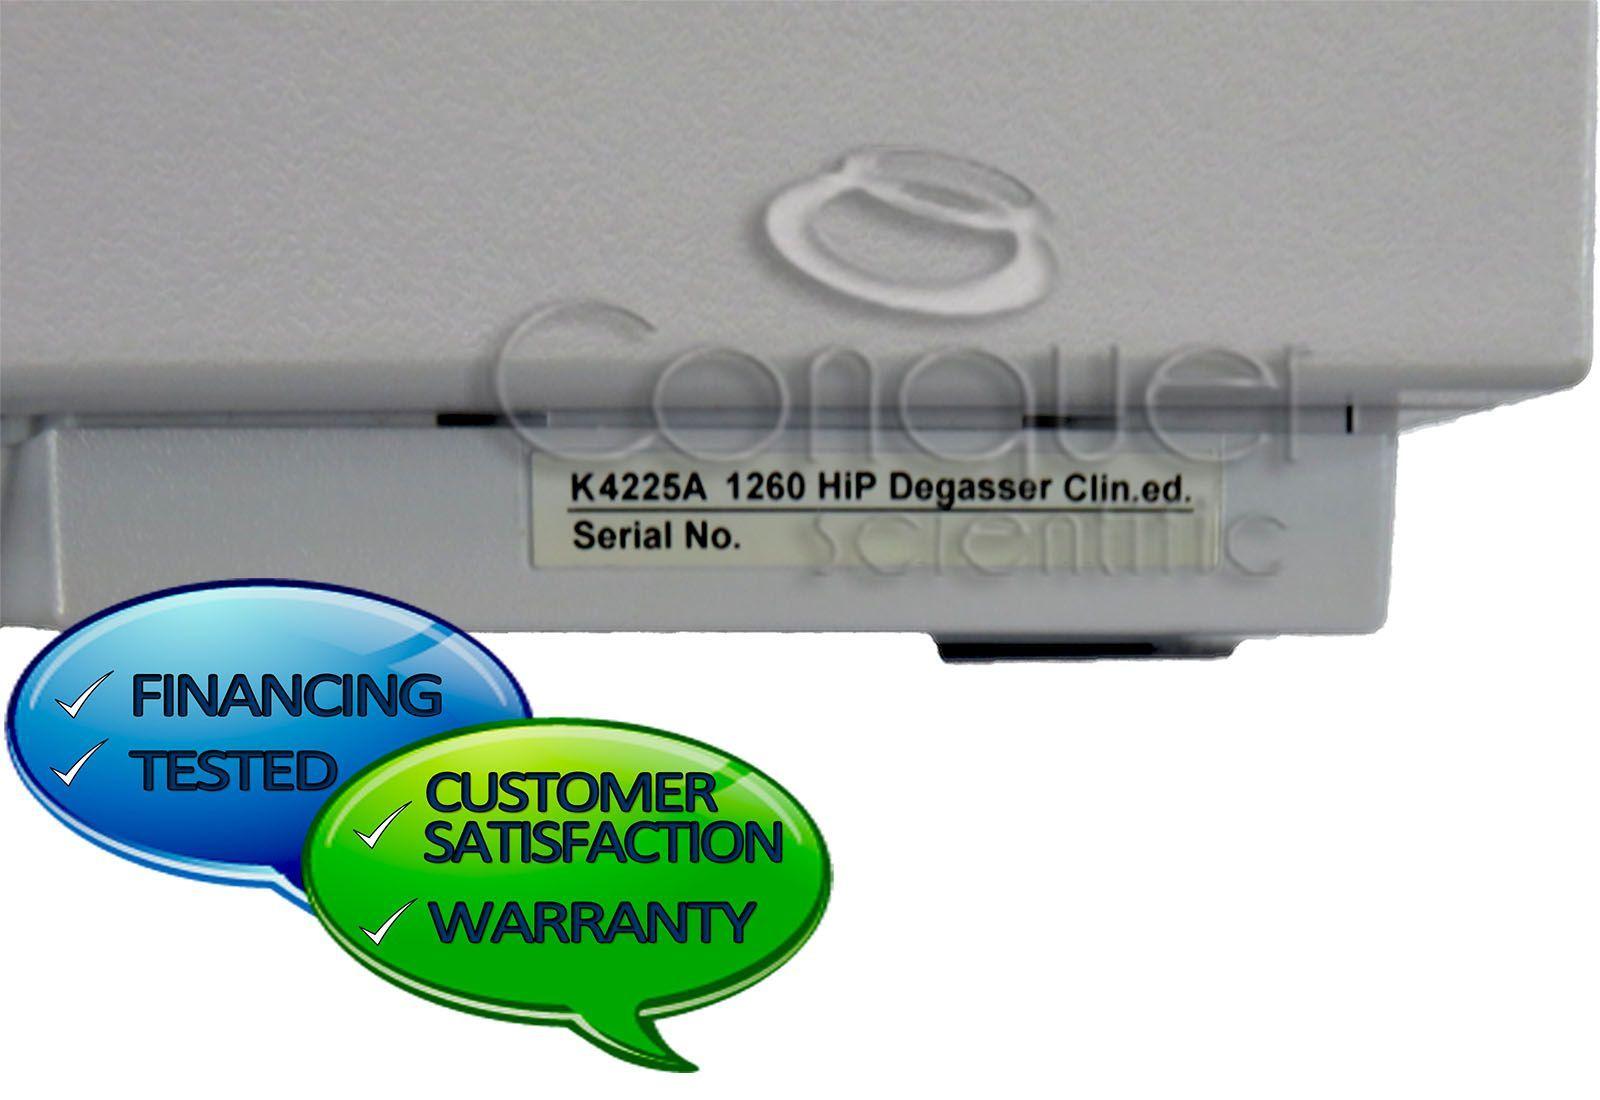 Agilent 1260 Infinity with Agilent 6420A Triple Quadrupole LCMS MS System